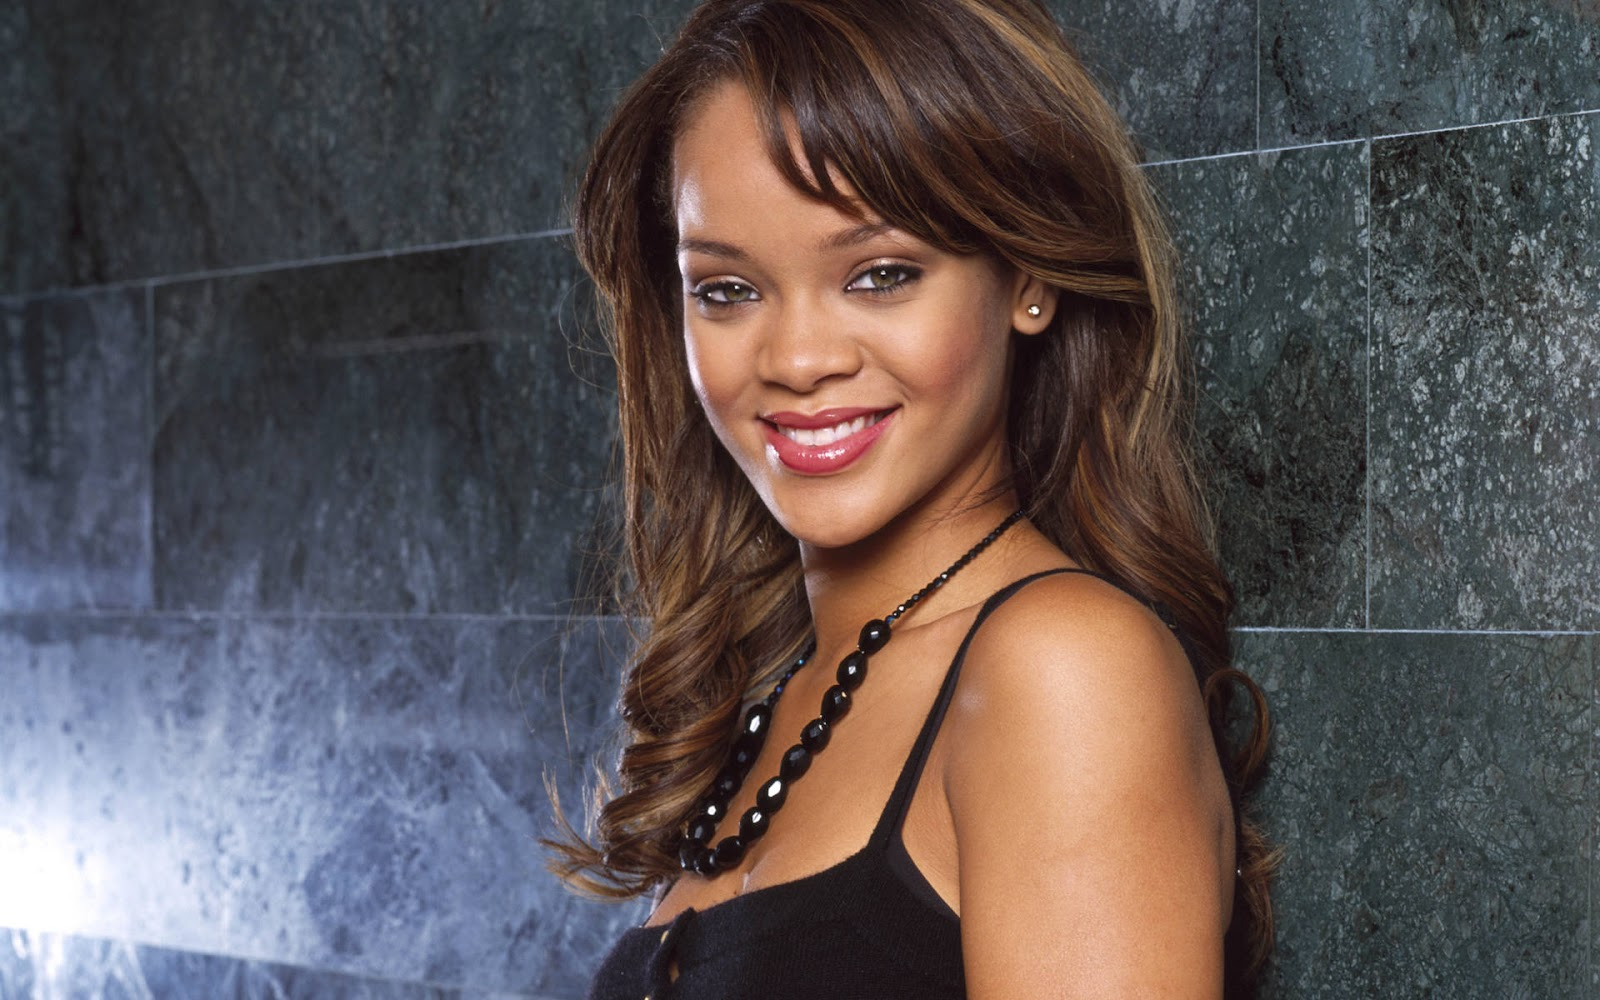 http://1.bp.blogspot.com/-3VPCtKcuFOQ/T9VRoSpUc9I/AAAAAAAADkE/969Pl9DAFBU/s1600/Rihanna-baby-photo-piccol+(10).jpg